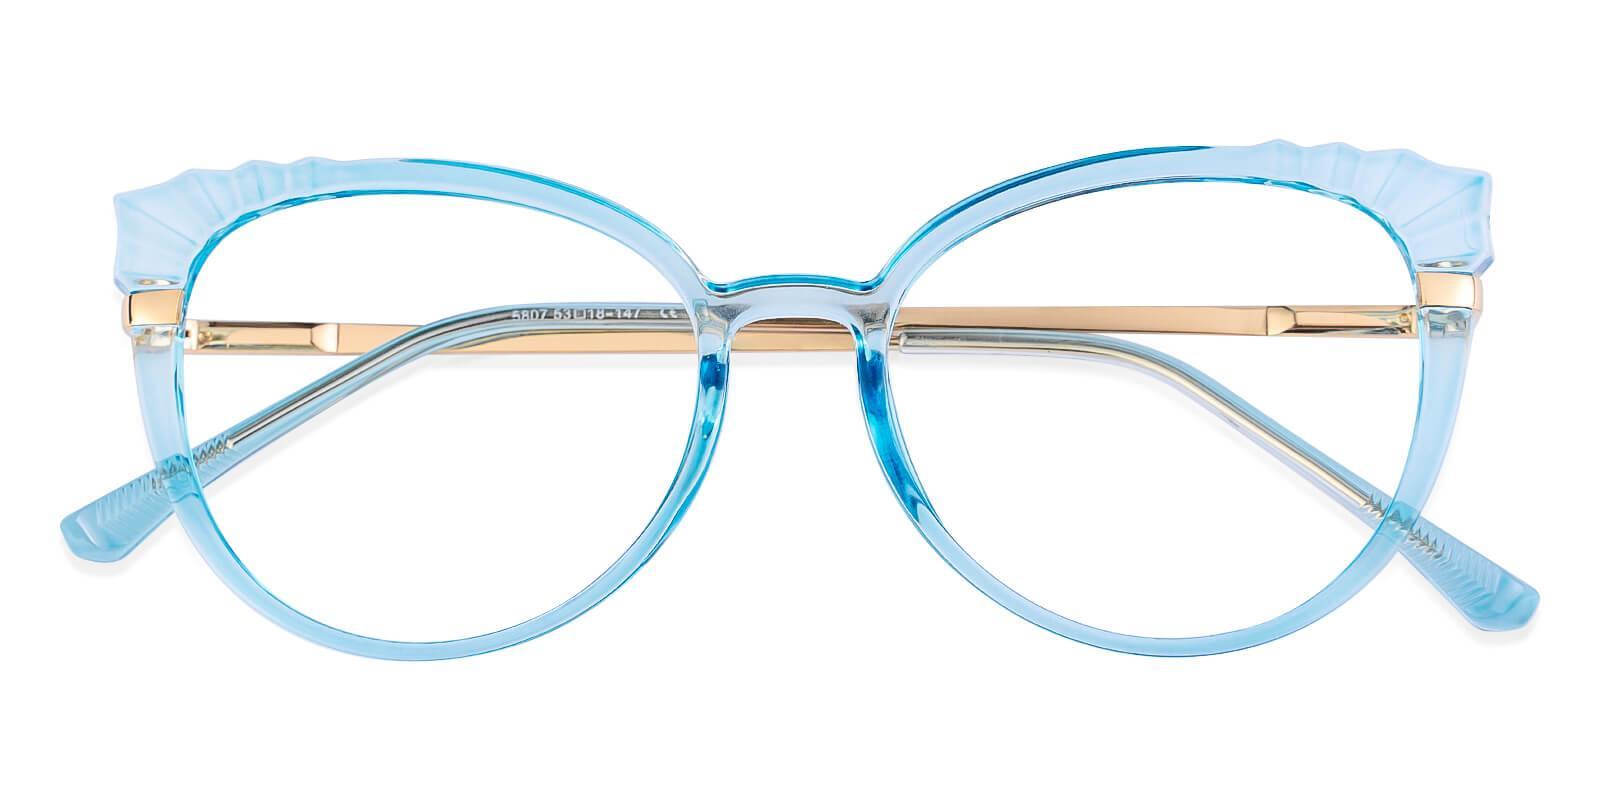 Iconic Blue Combination Eyeglasses , Fashion , SpringHinges , UniversalBridgeFit Frames from ABBE Glasses